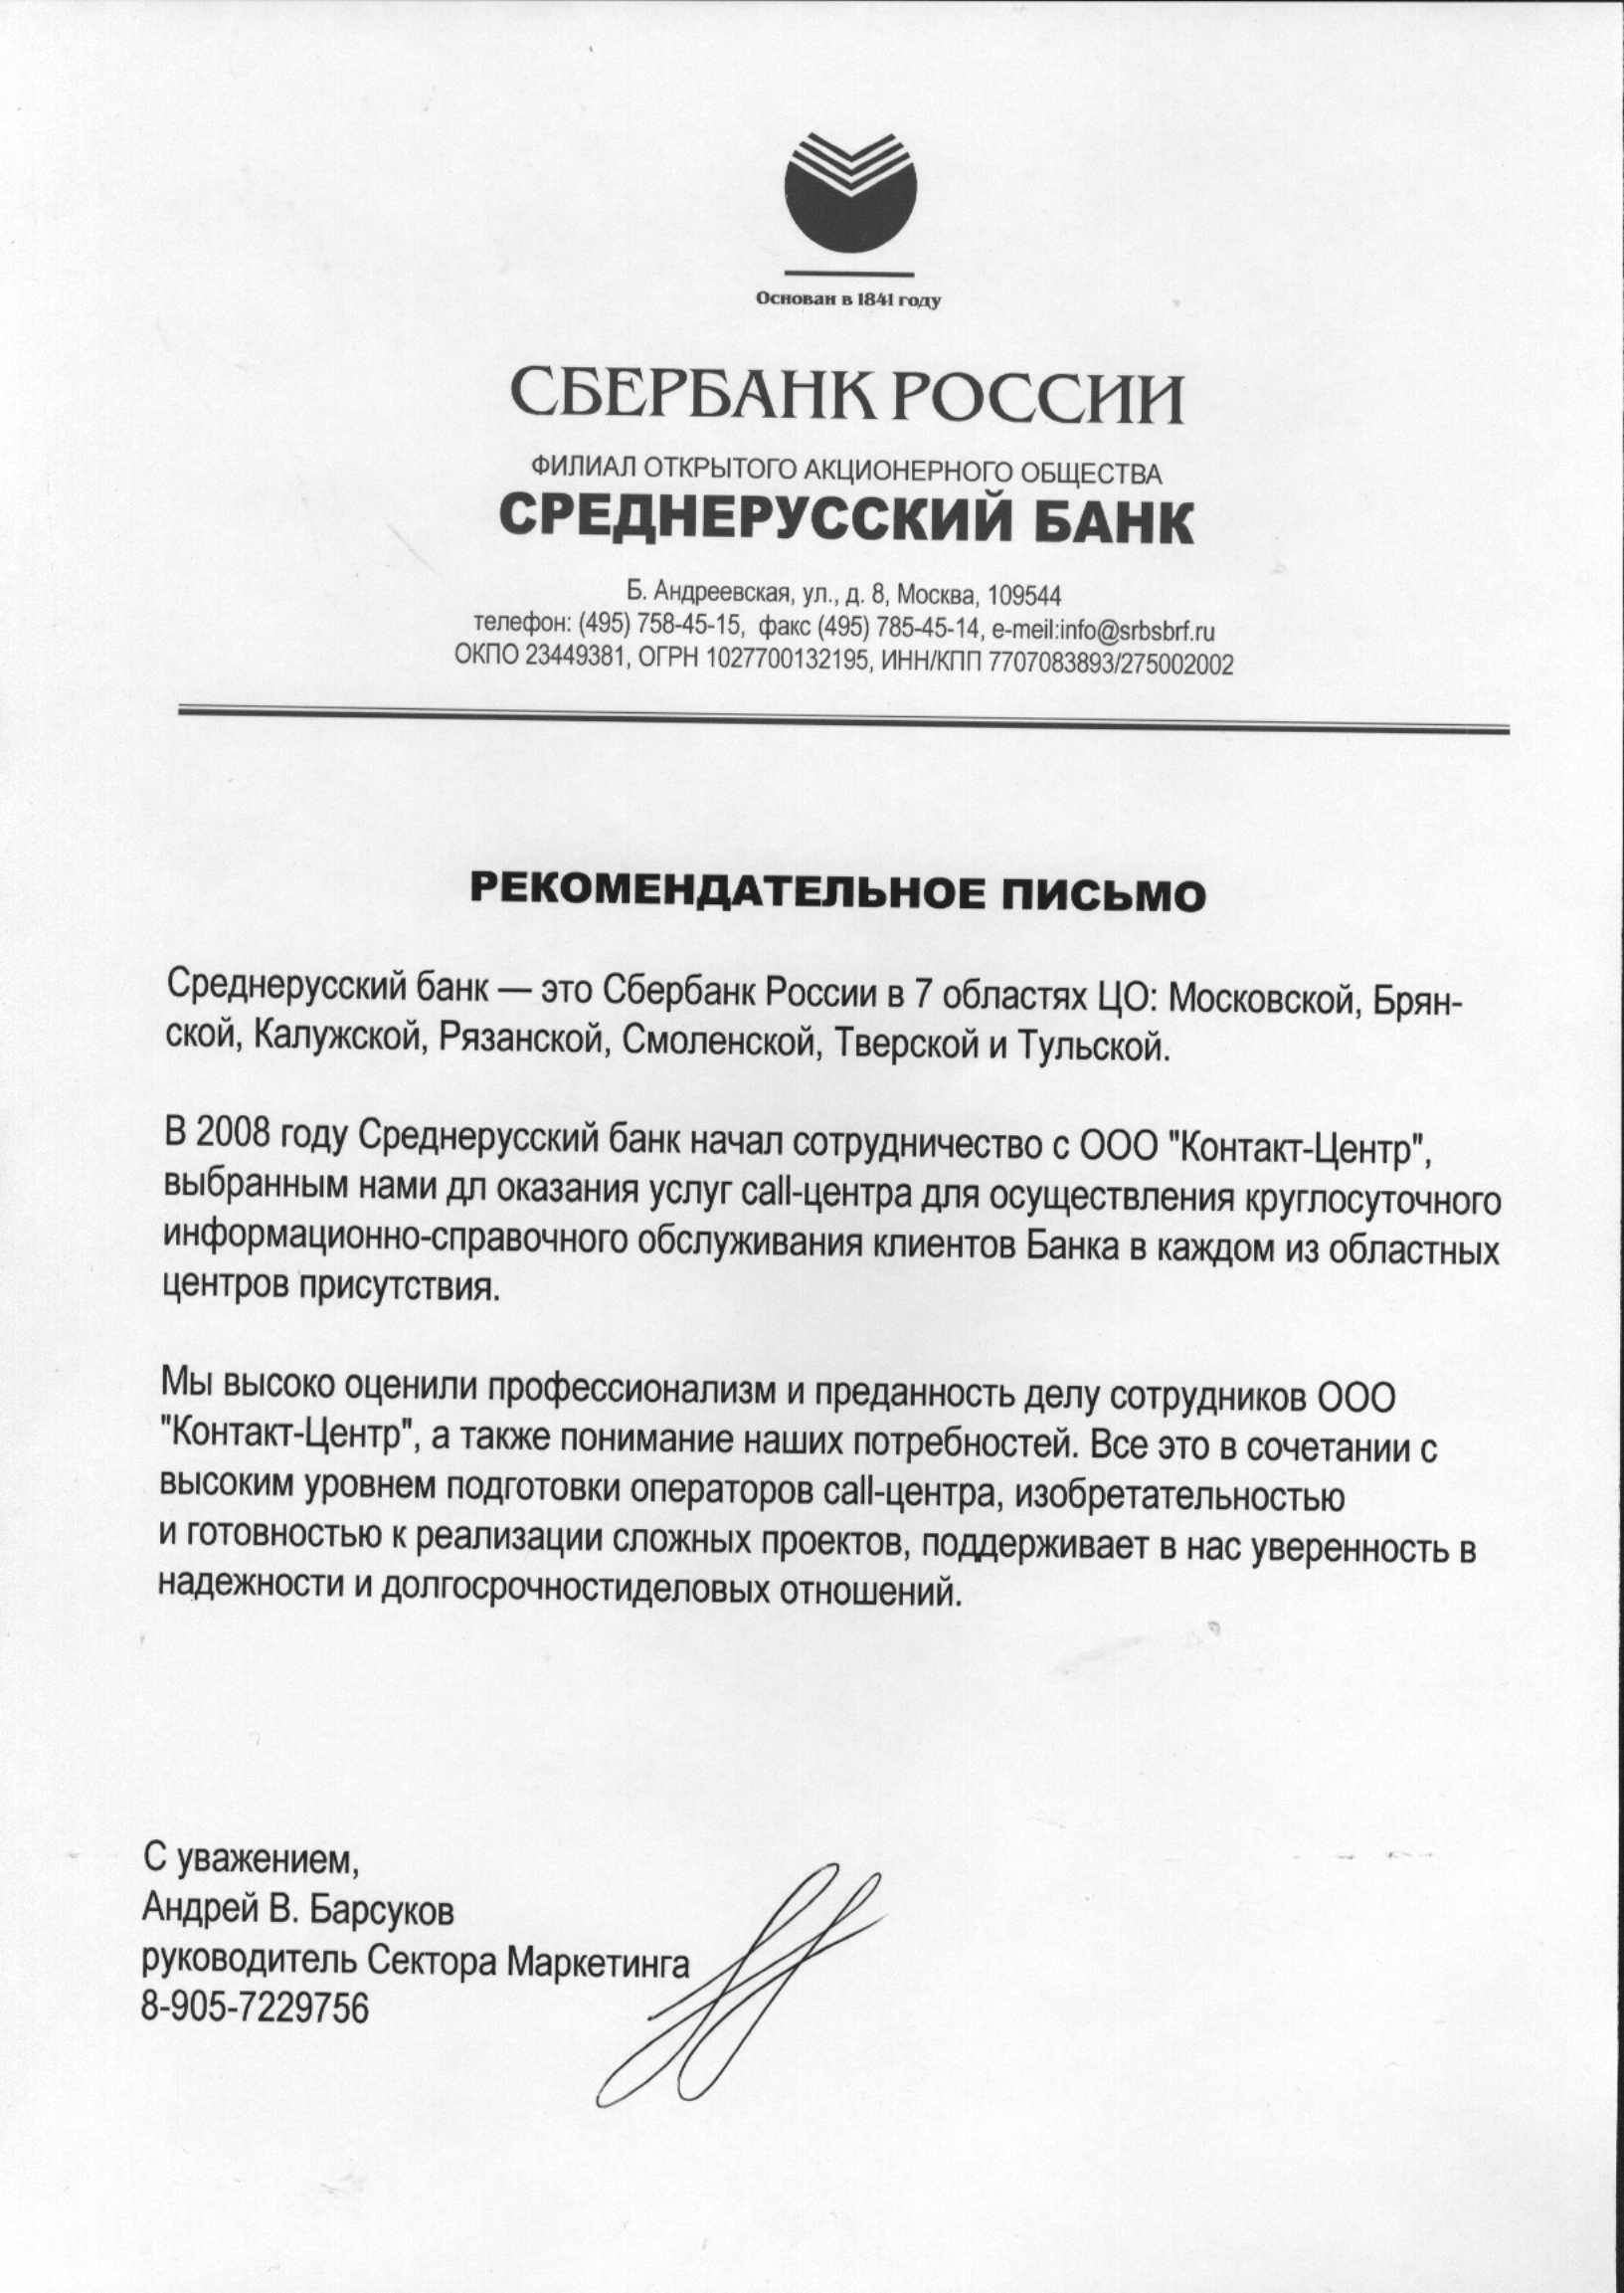 Займы на qiwi без привязки карты zaimyna-kartu.ru